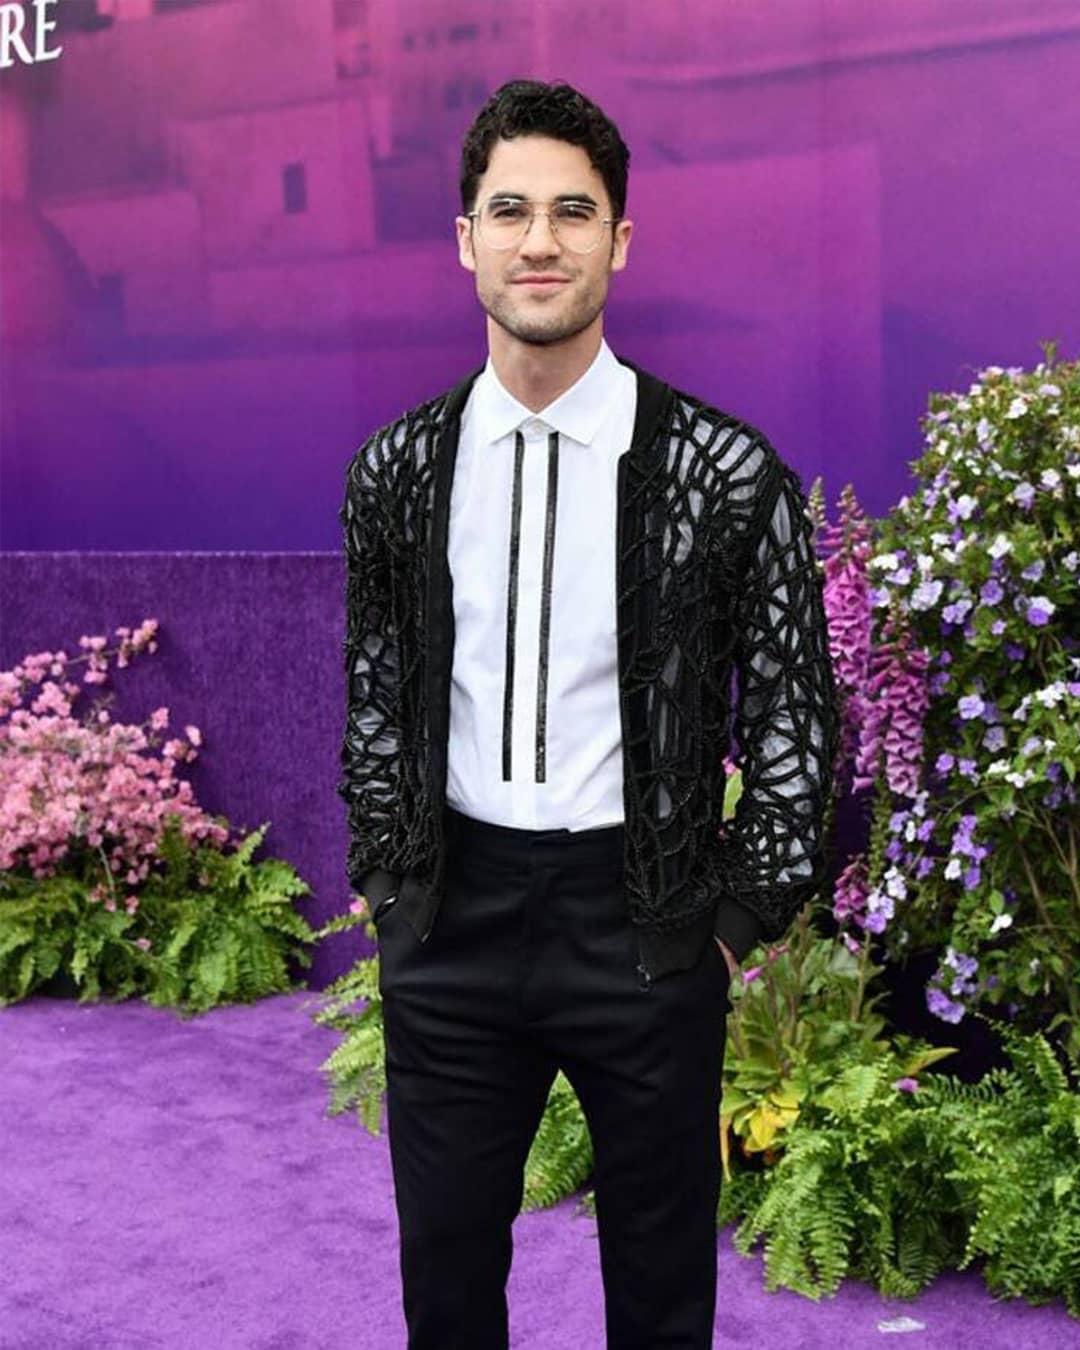 Look Filipino Designer S Jackets Worn By Hollywood Stars Darren Criss Mena Massoud The Filipino Times